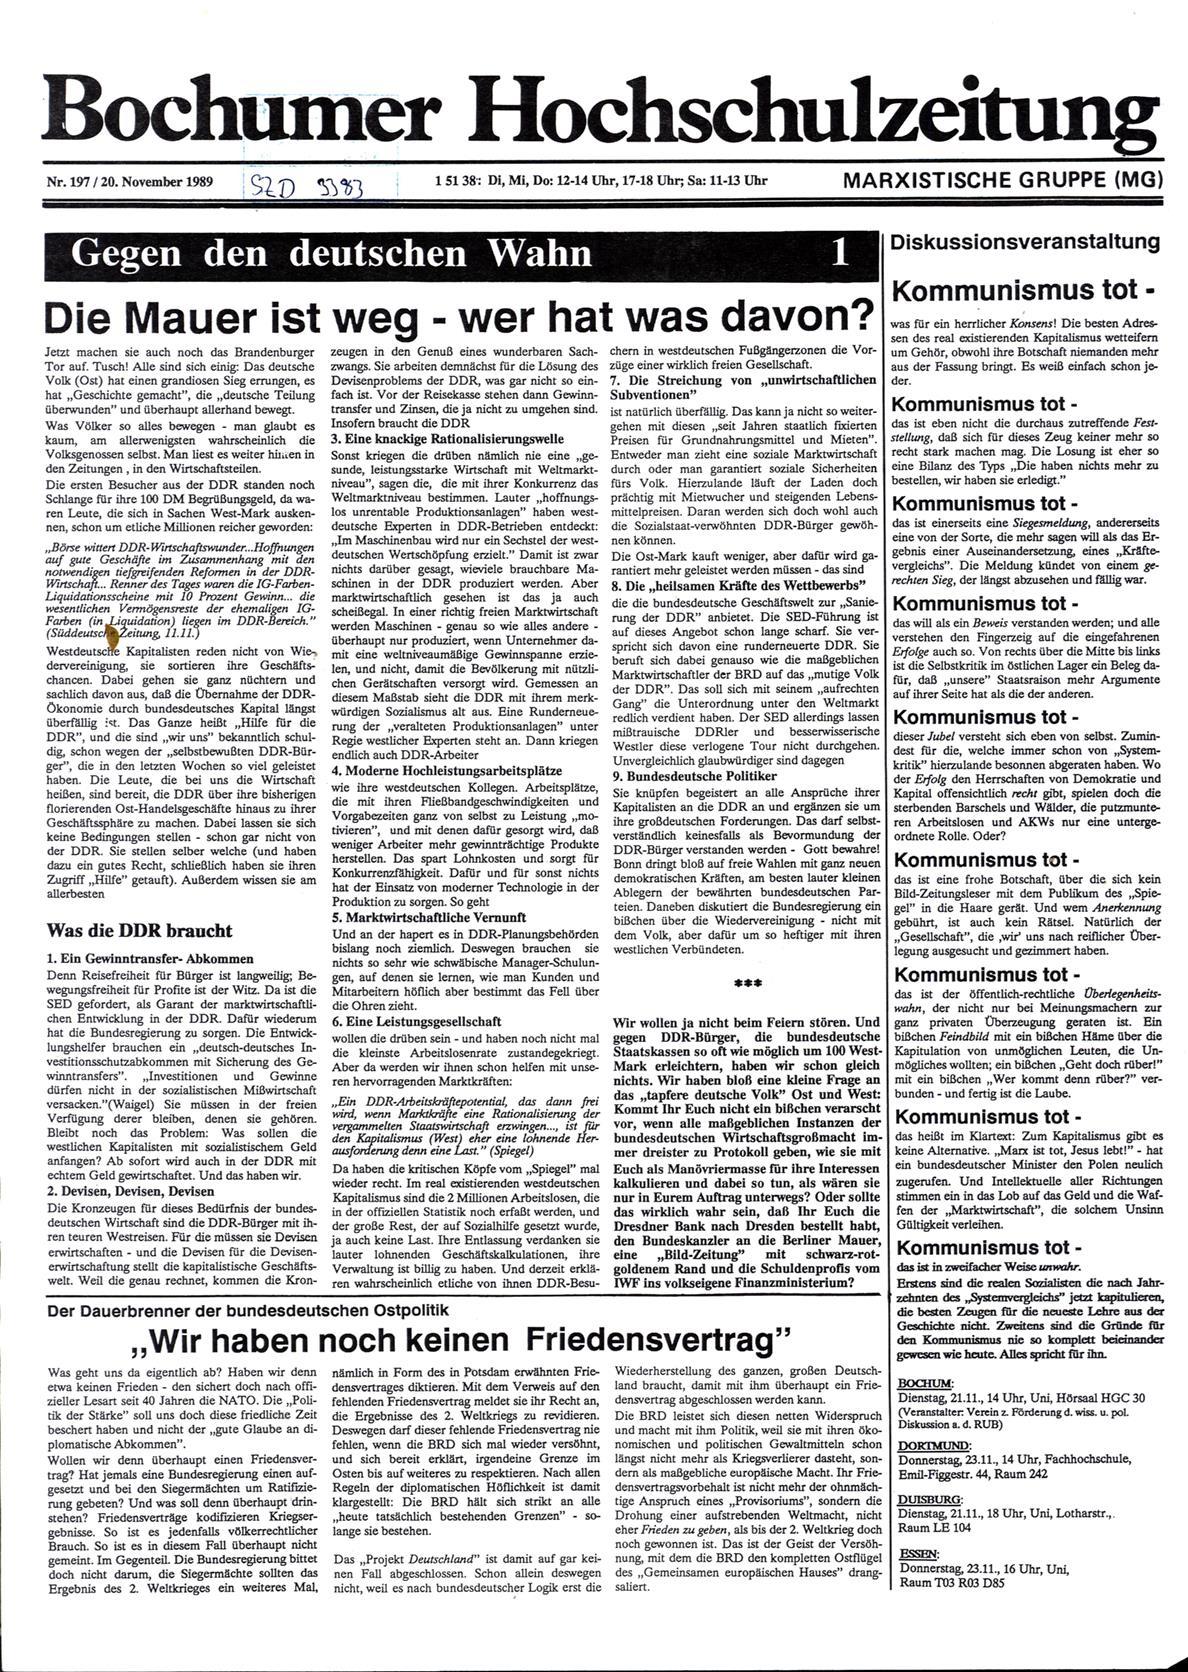 Bochum_BHZ_19891120_197_001